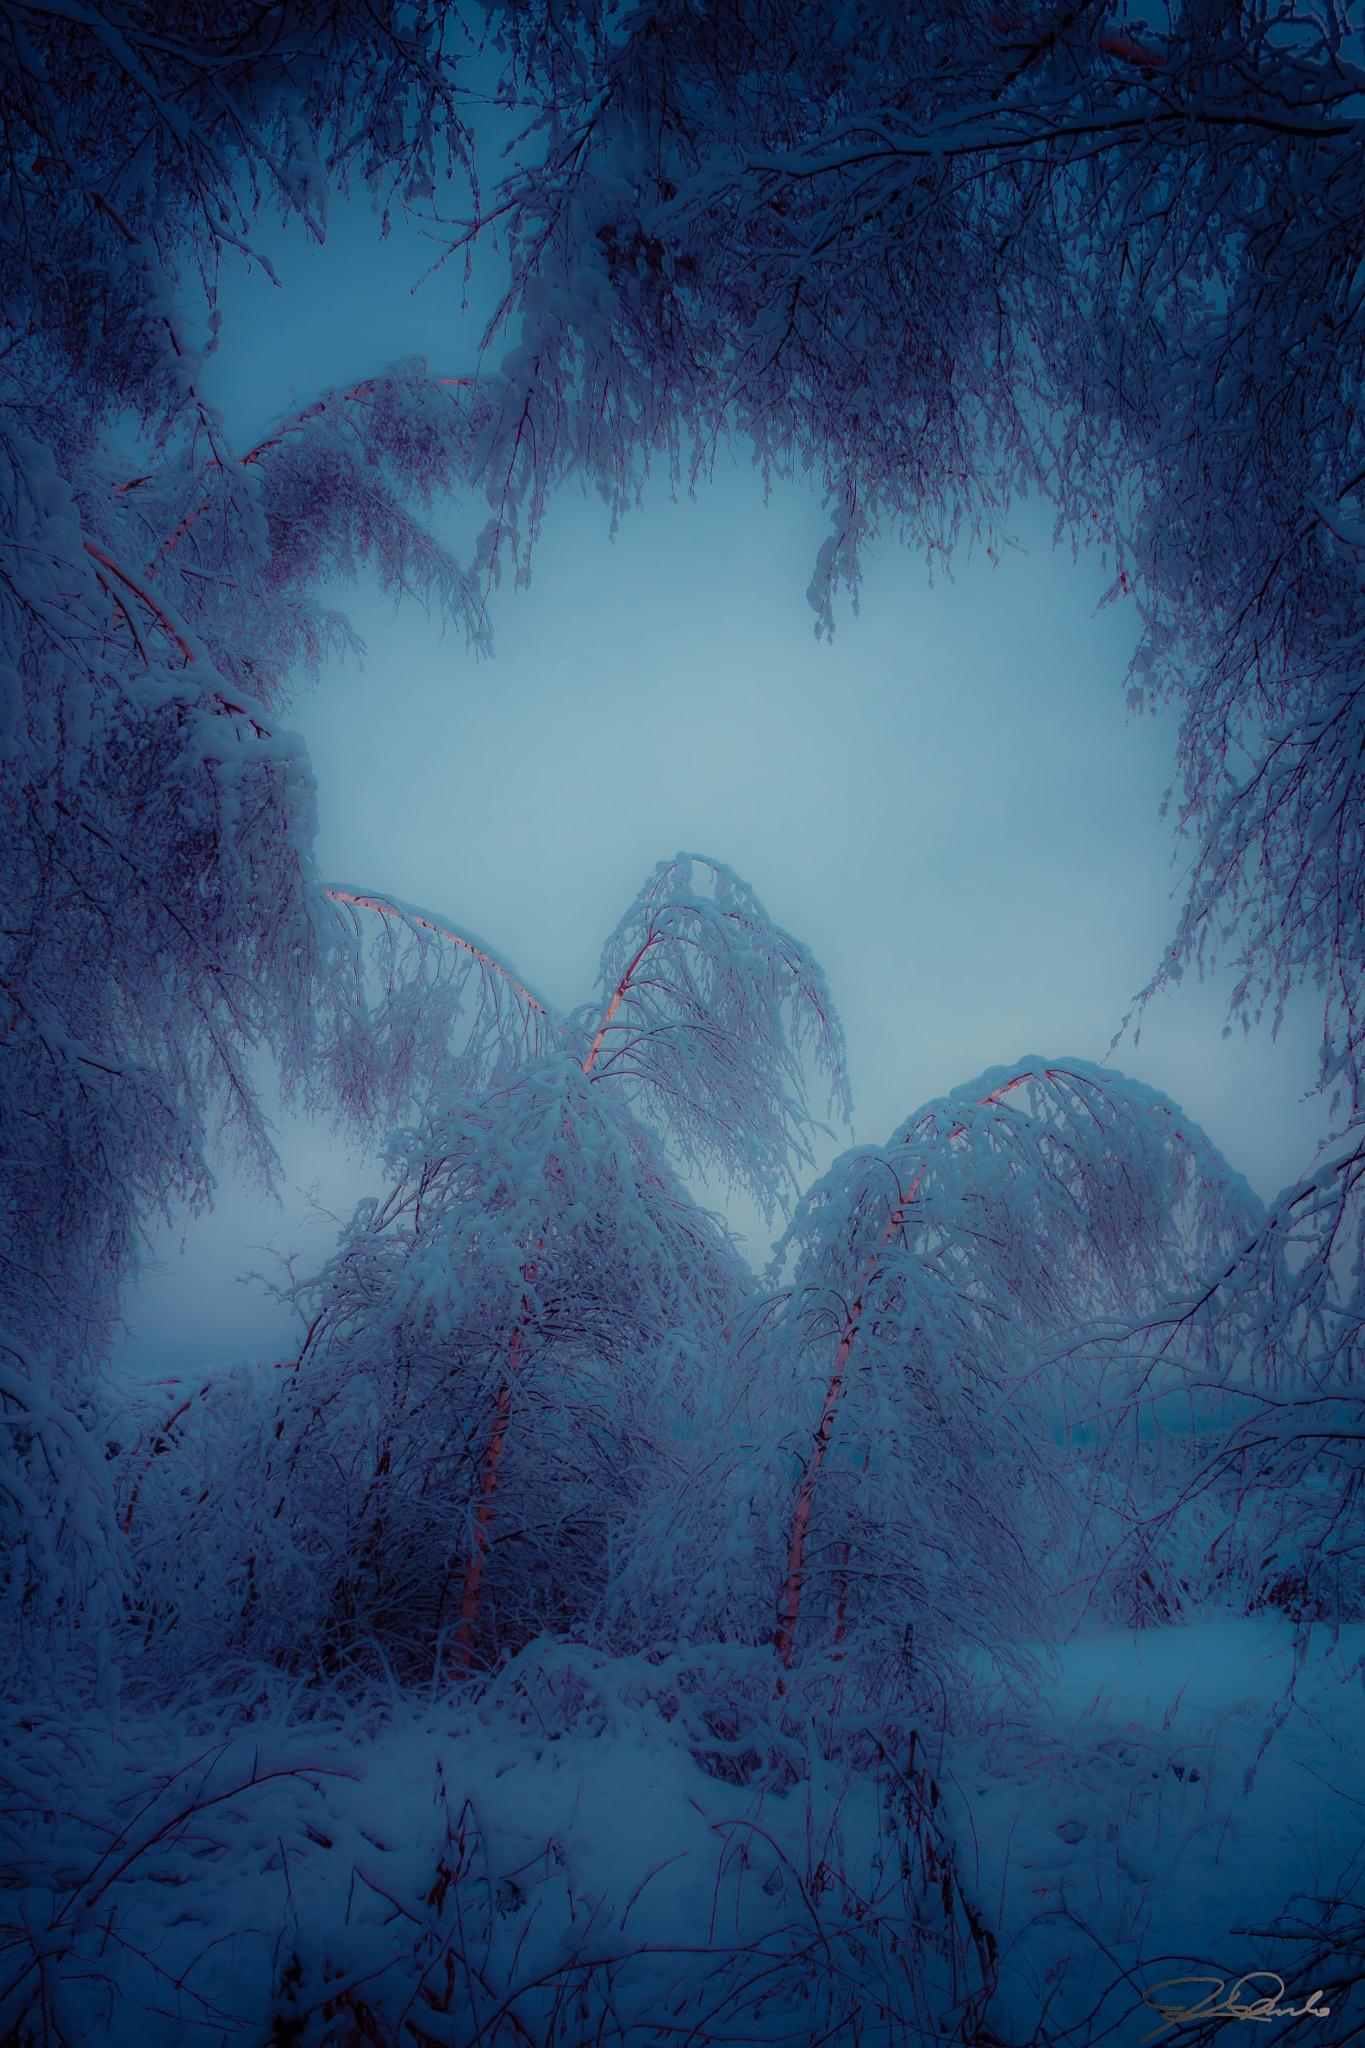 *Snow Snow Snow* by Kicka Terho